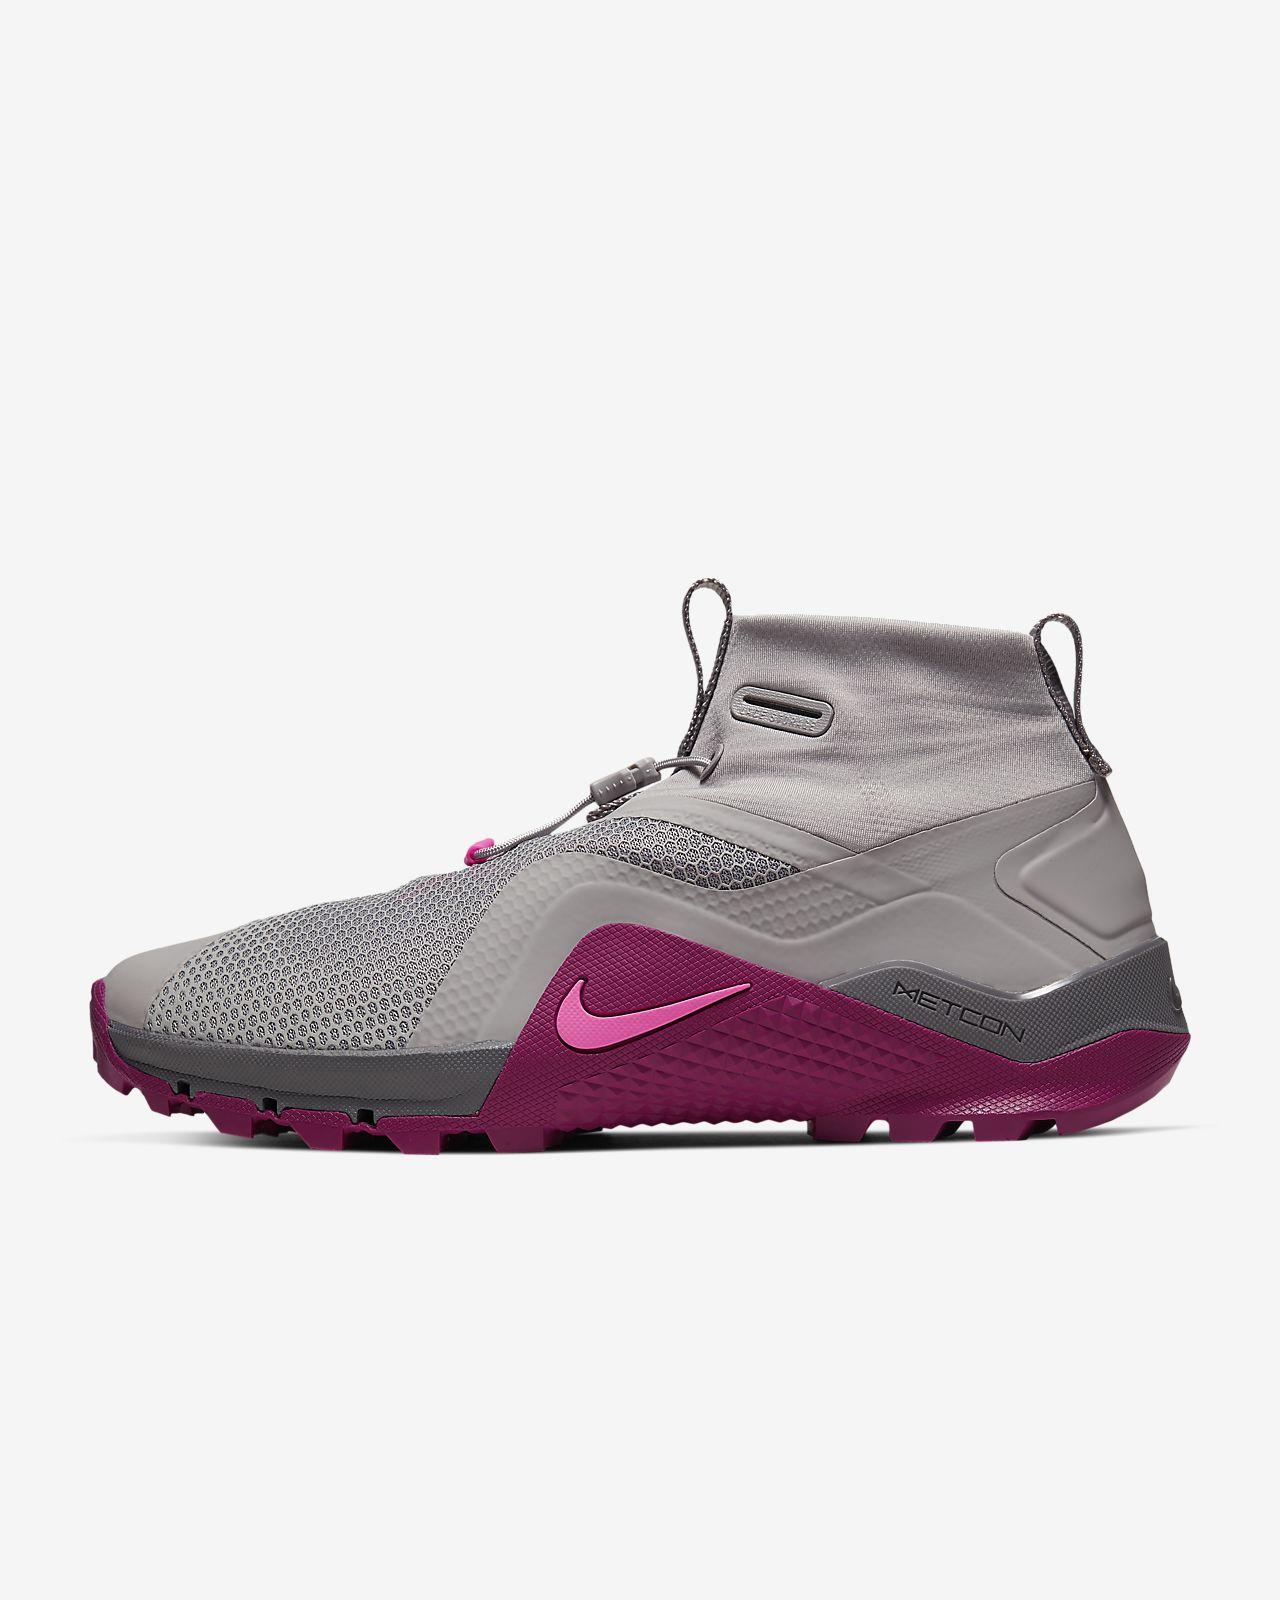 Chaussure de training Nike MetconSF